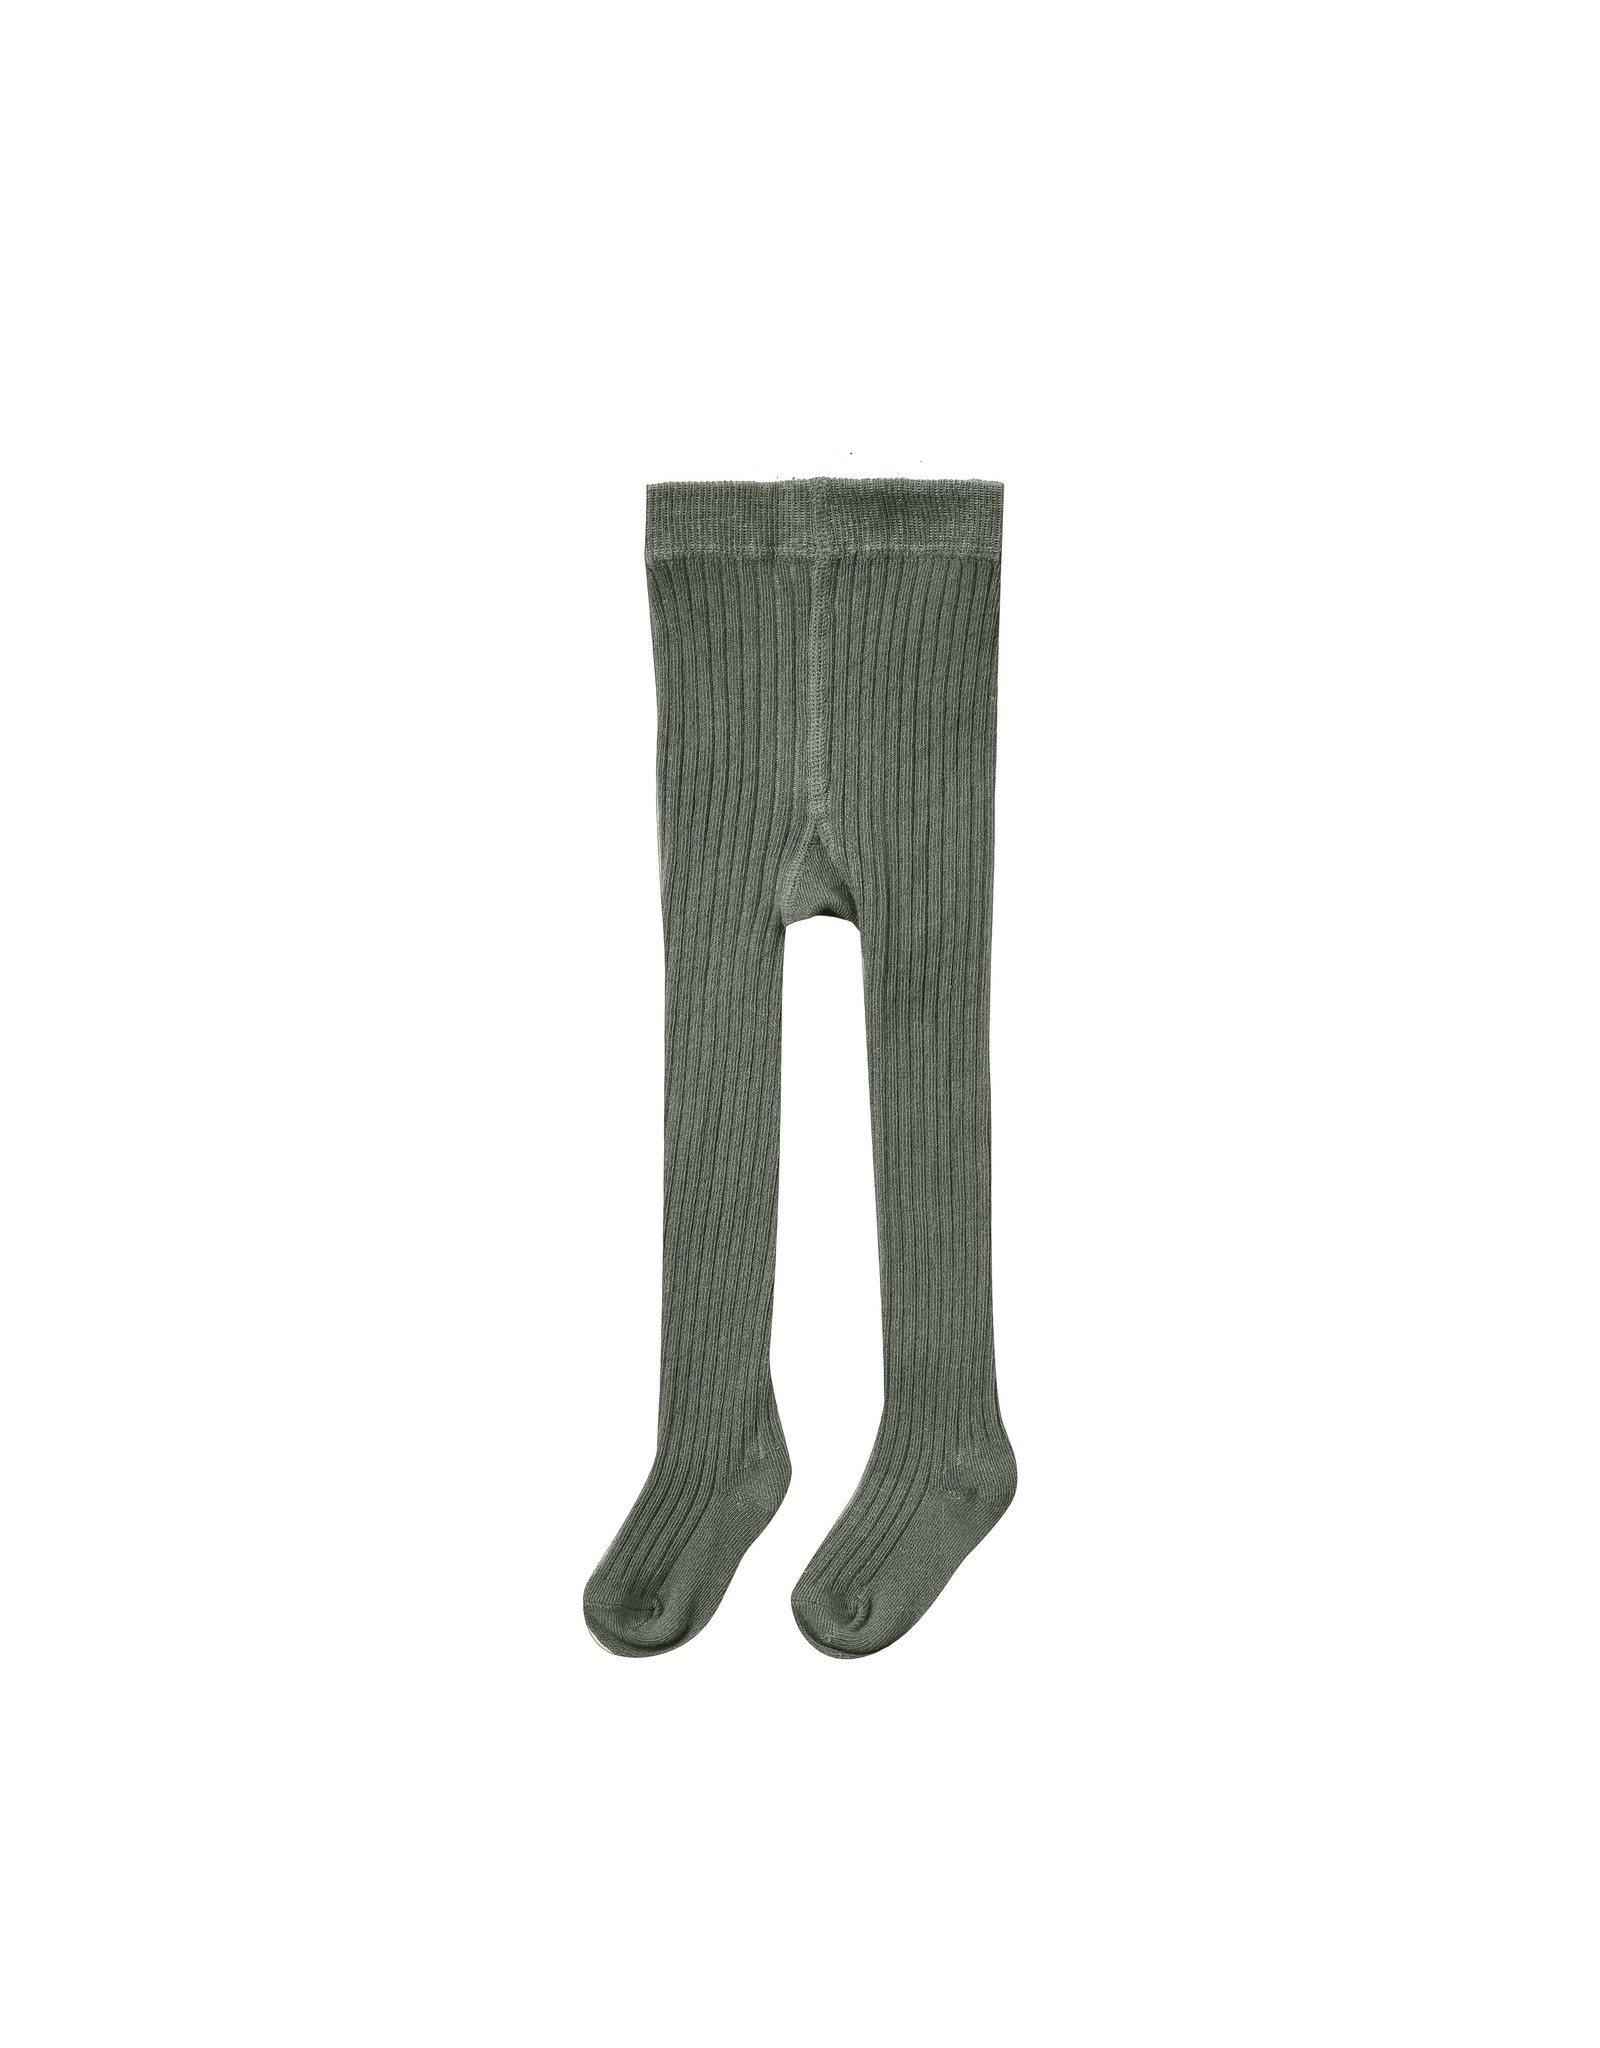 Rylee and Cru rib knit tights